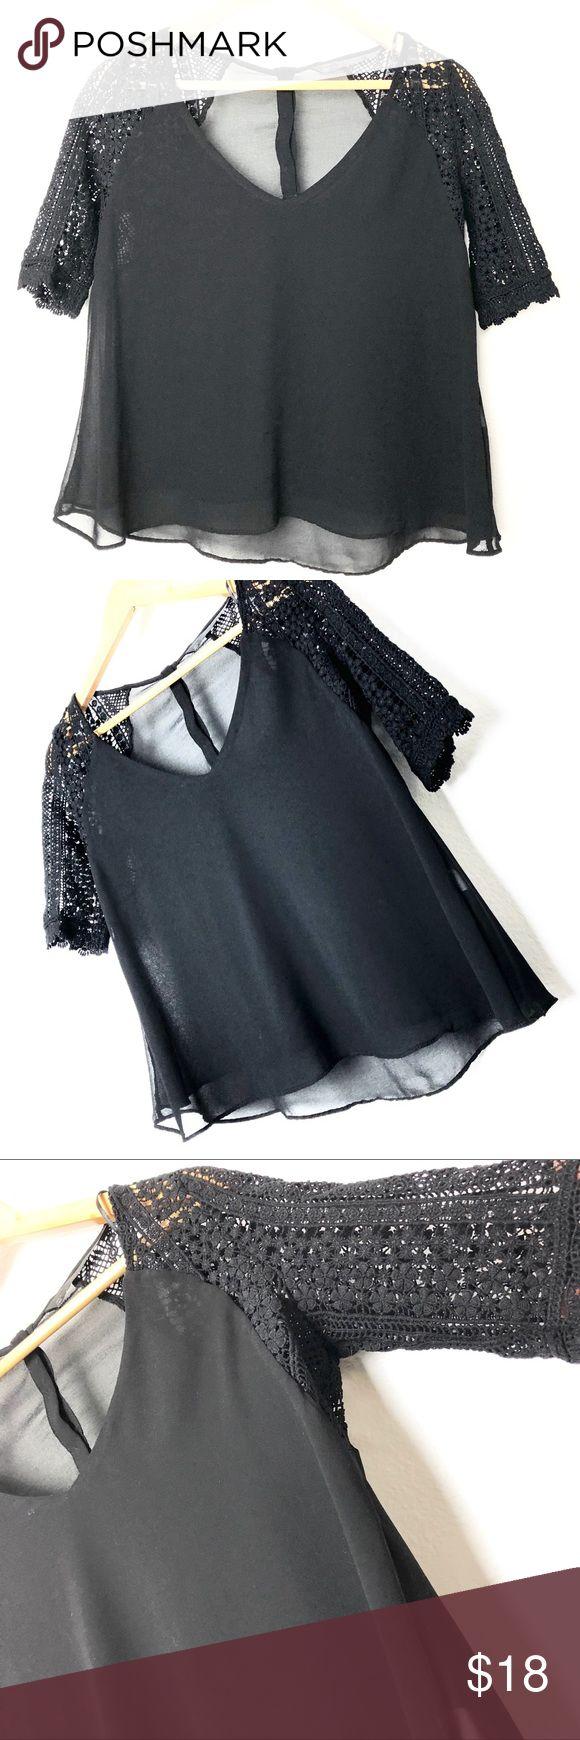 Zara Trafaluc black lace sleeves blouse